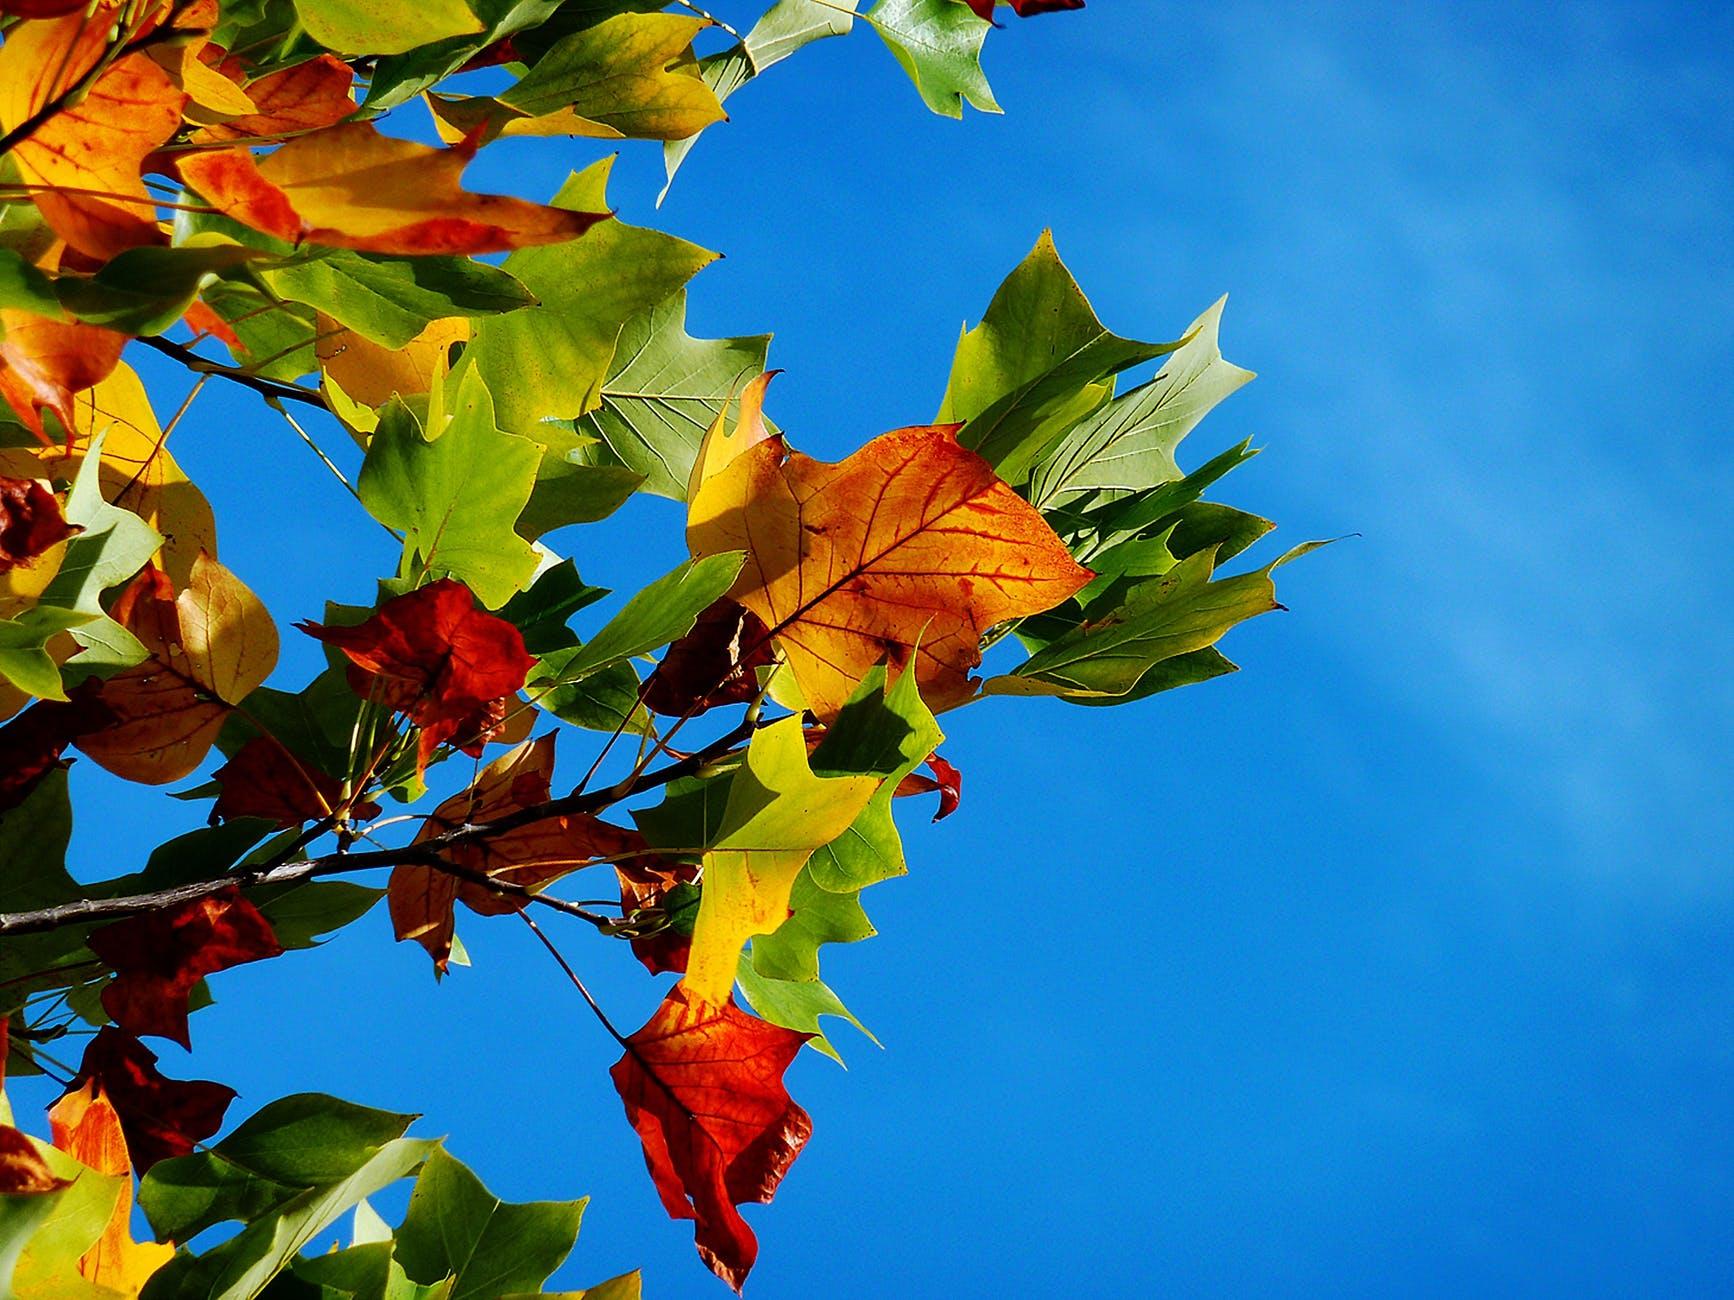 autumn-fall-leaves-leaves-fall-color